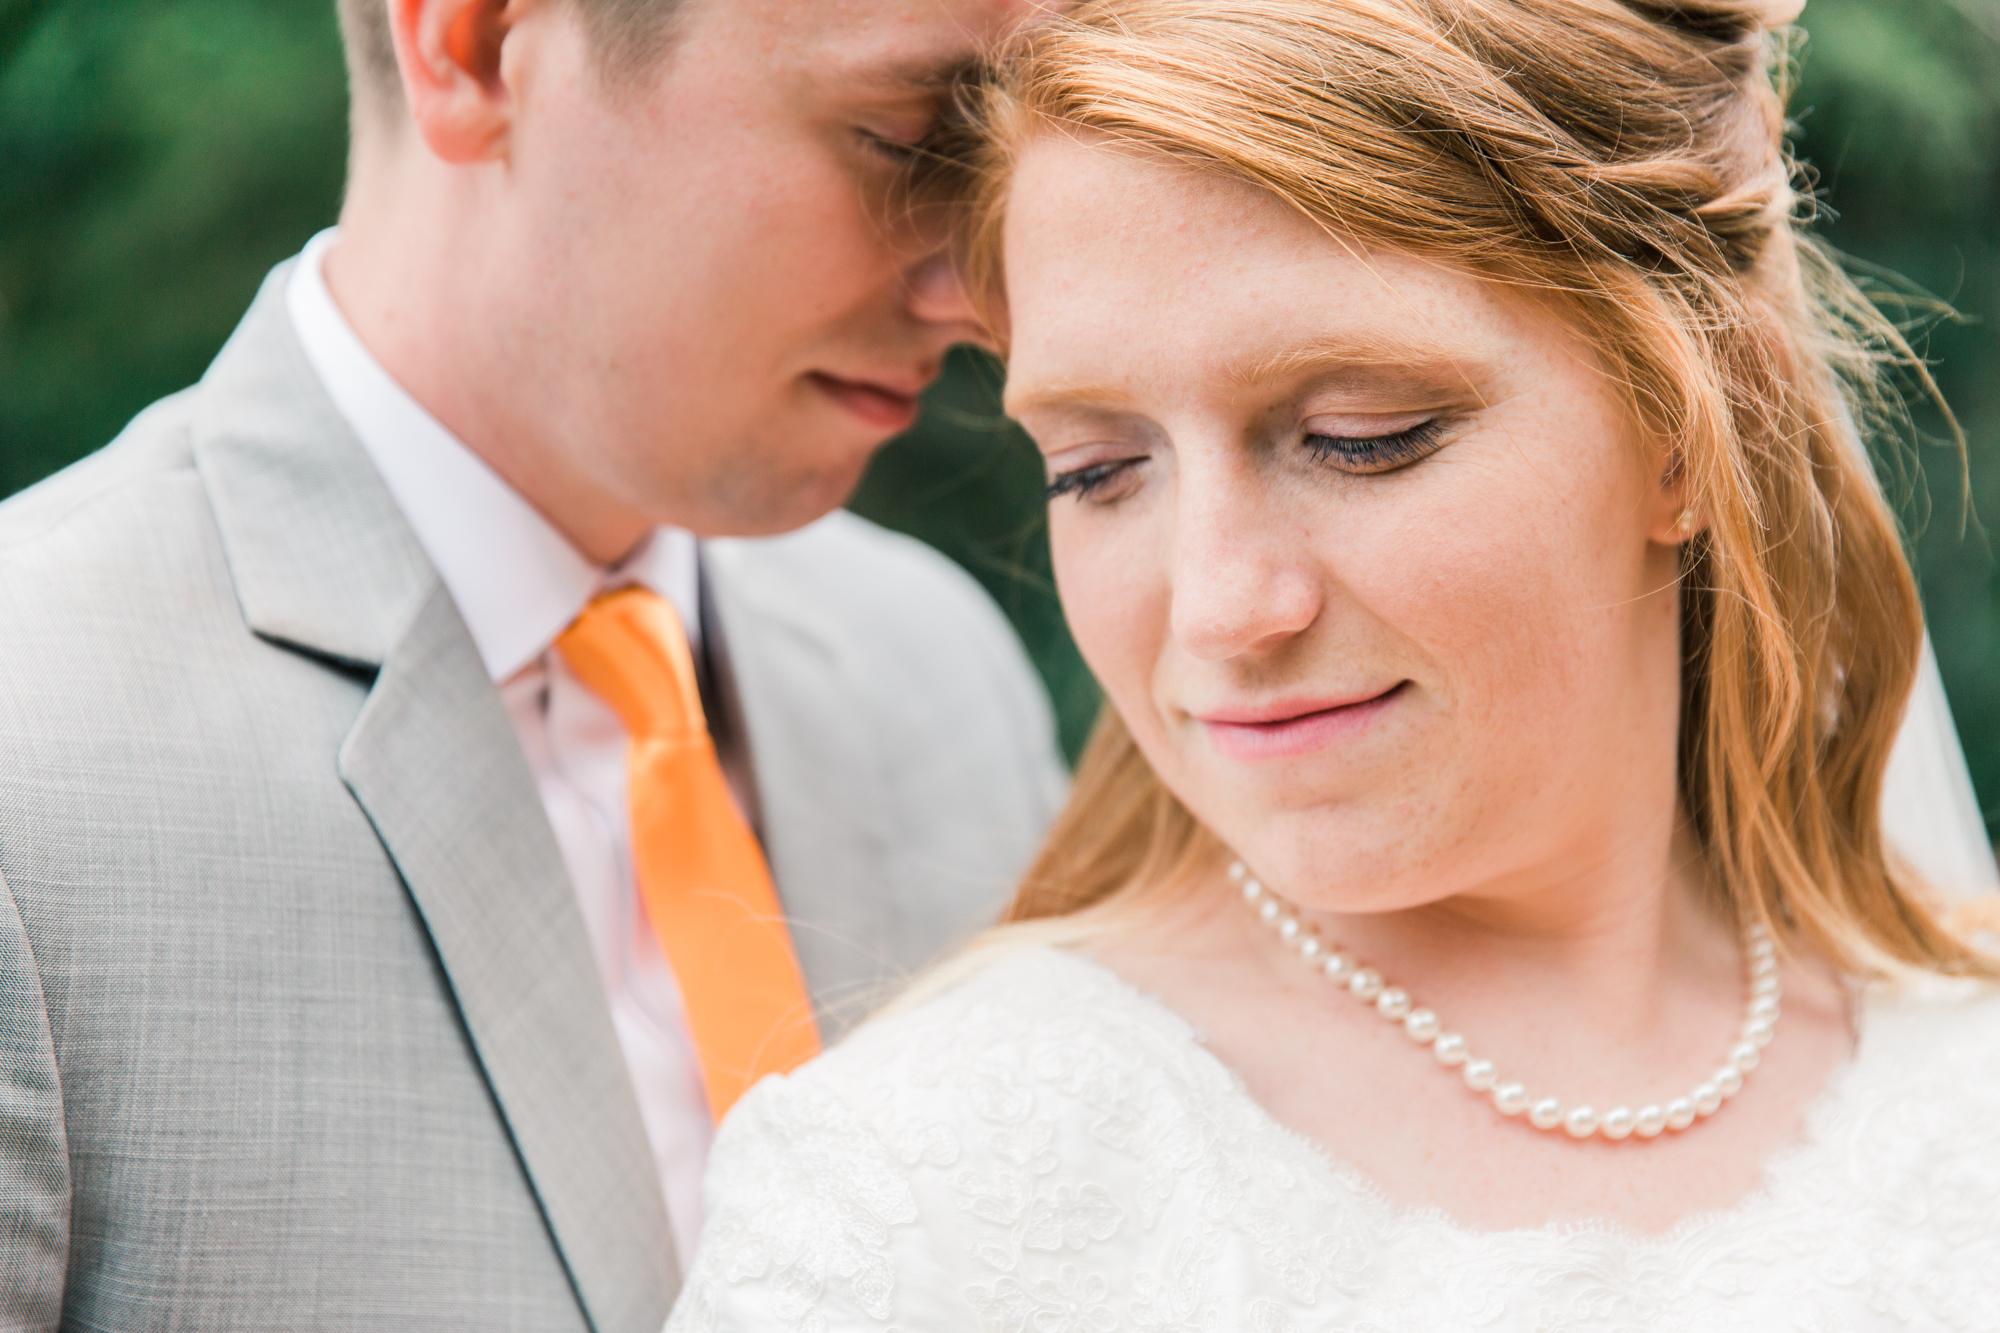 Minnesota Wedding Photographer| Sierra & Jacob | LDS Photographer | Fine Art | Bride & Groom |Eden & Me Photography